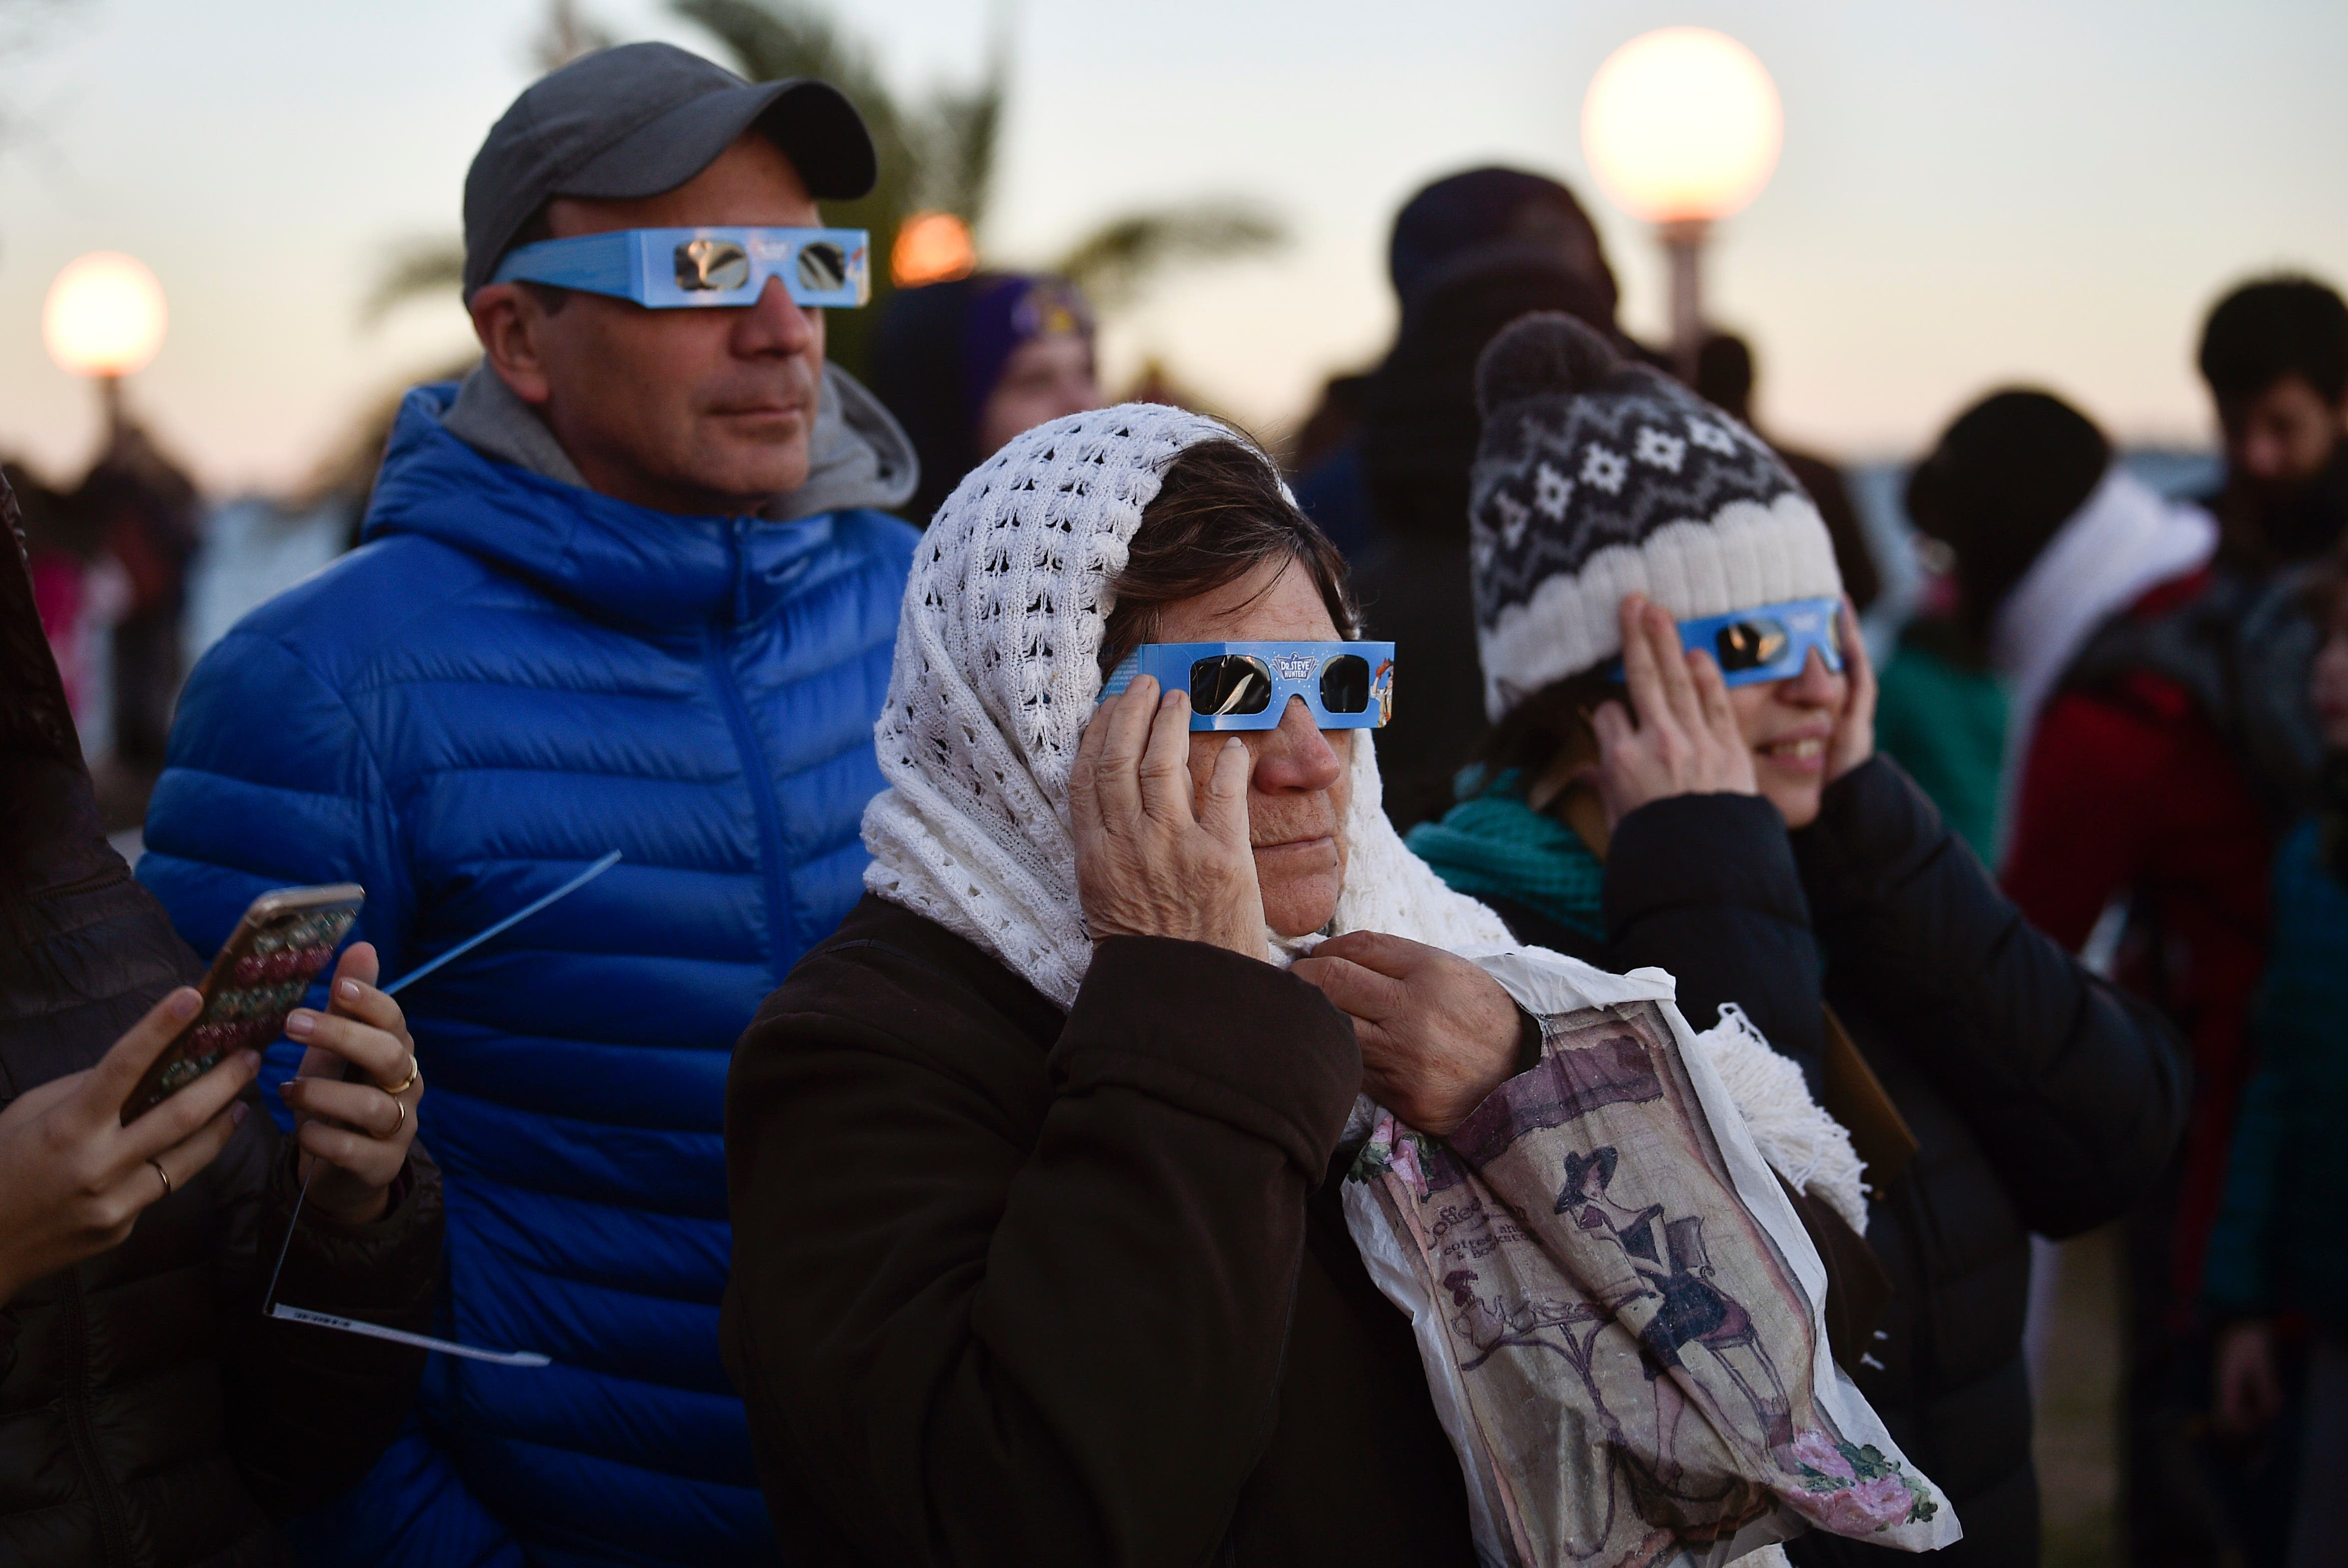 5. Personas observan el eclipse solar en Chascomus, Argentina.AP